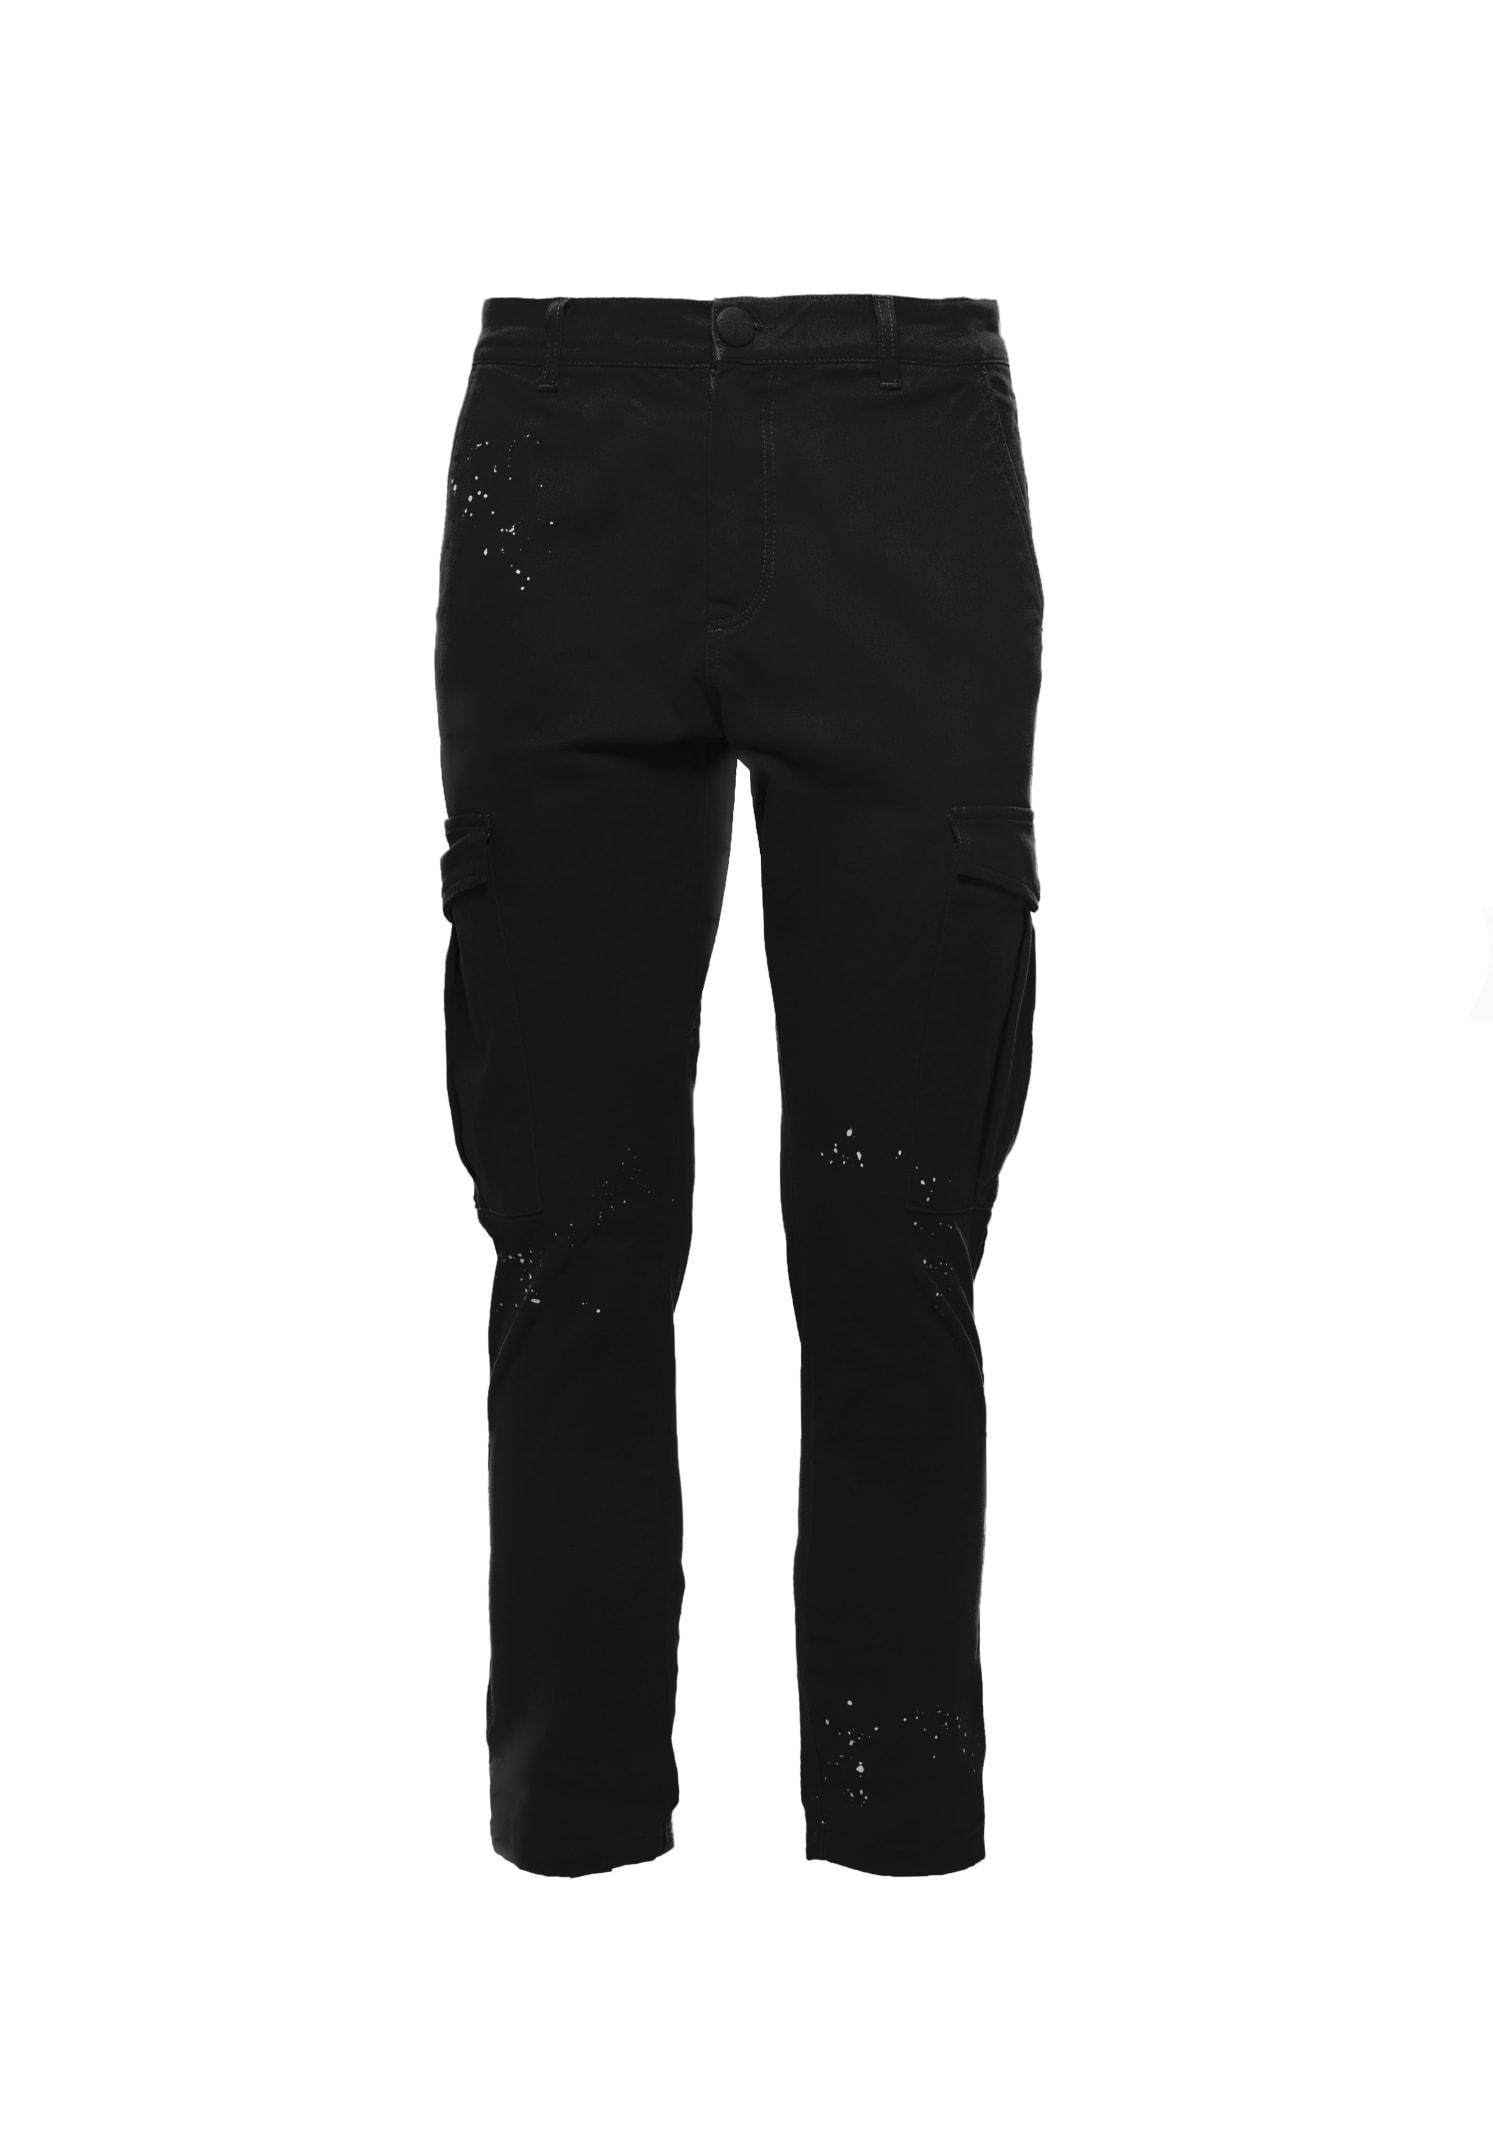 Pants Cargo Black